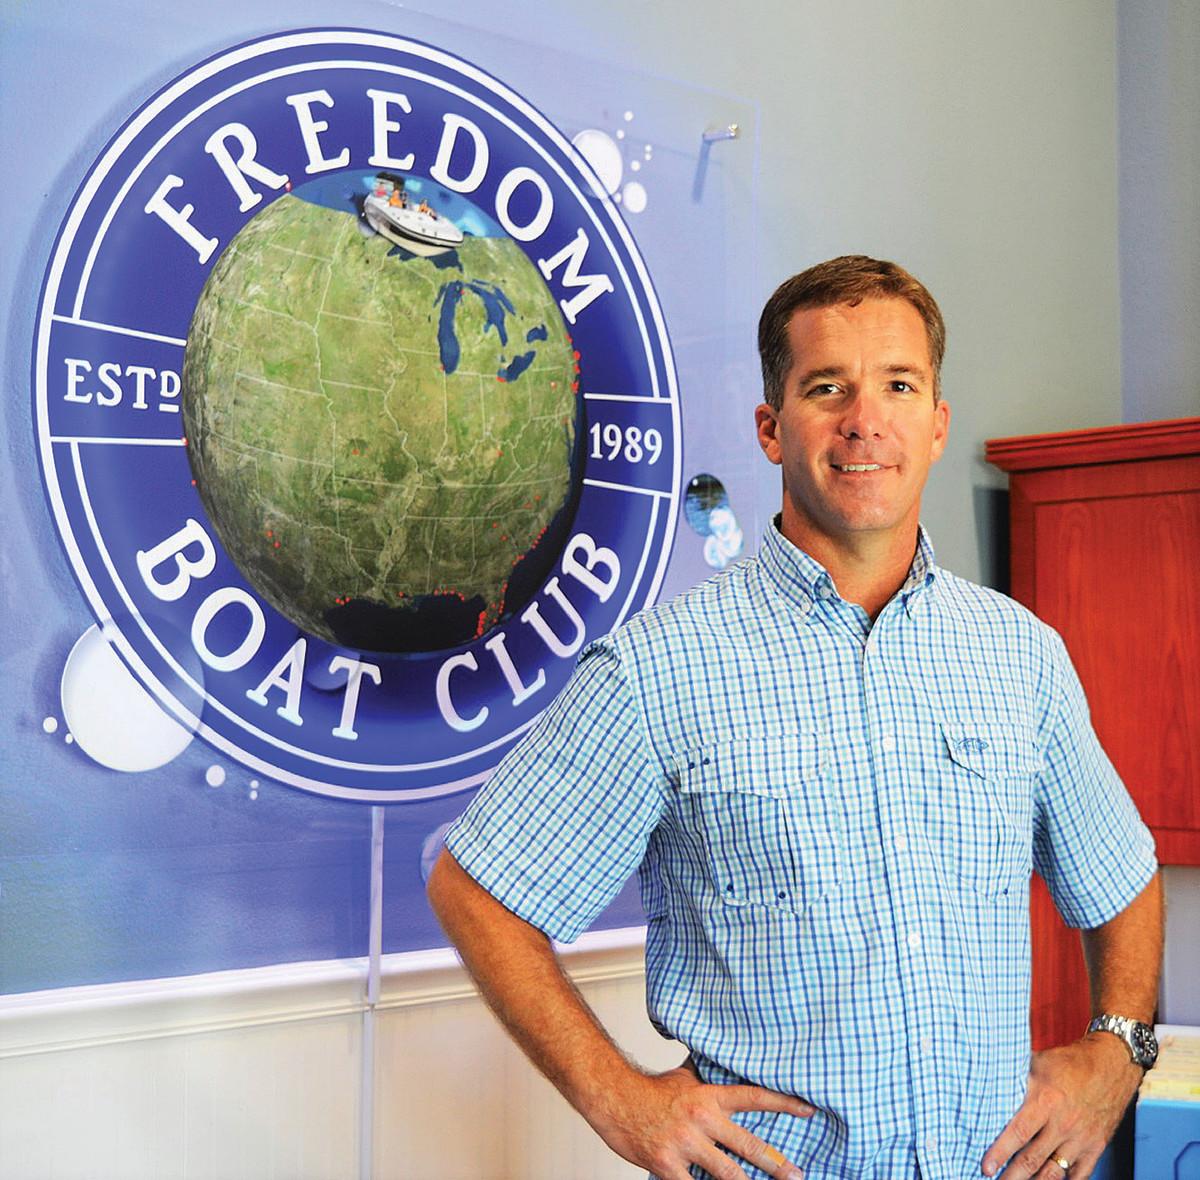 John Giglio, president of Freedom Boat Club.